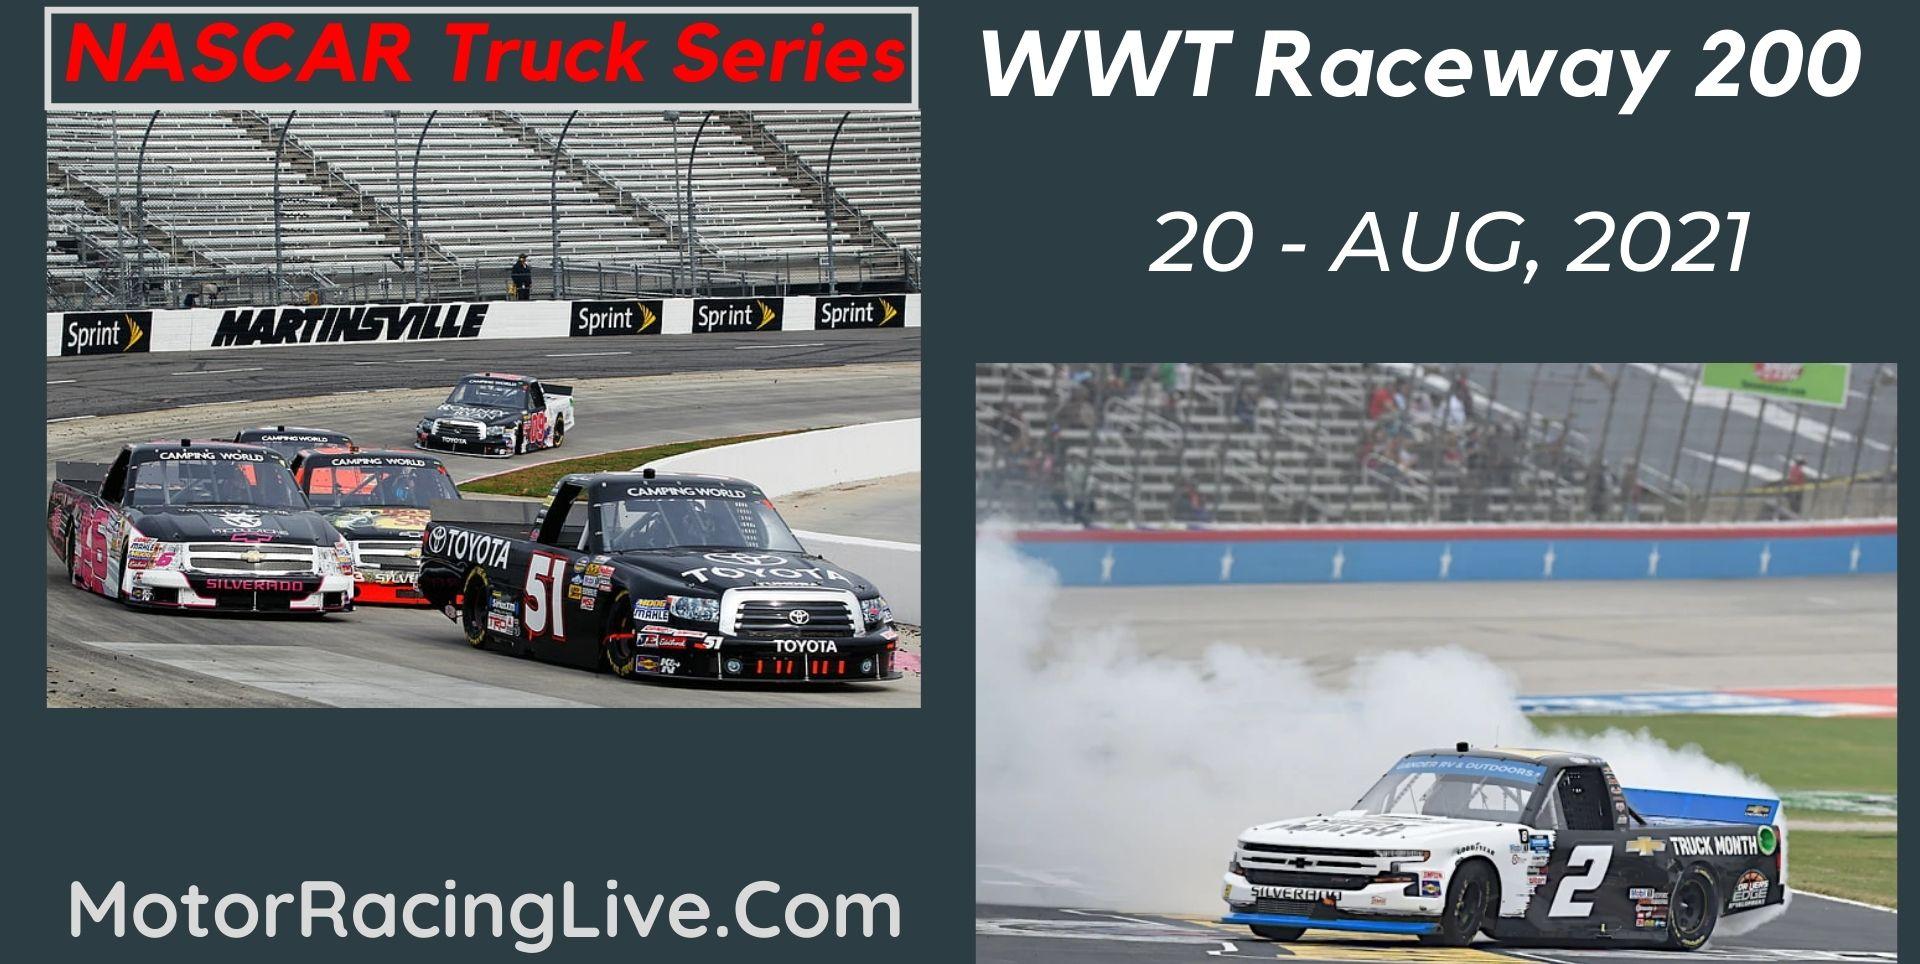 WWT Raceway 200 Live Stream 2021: NASCAR Truck Series